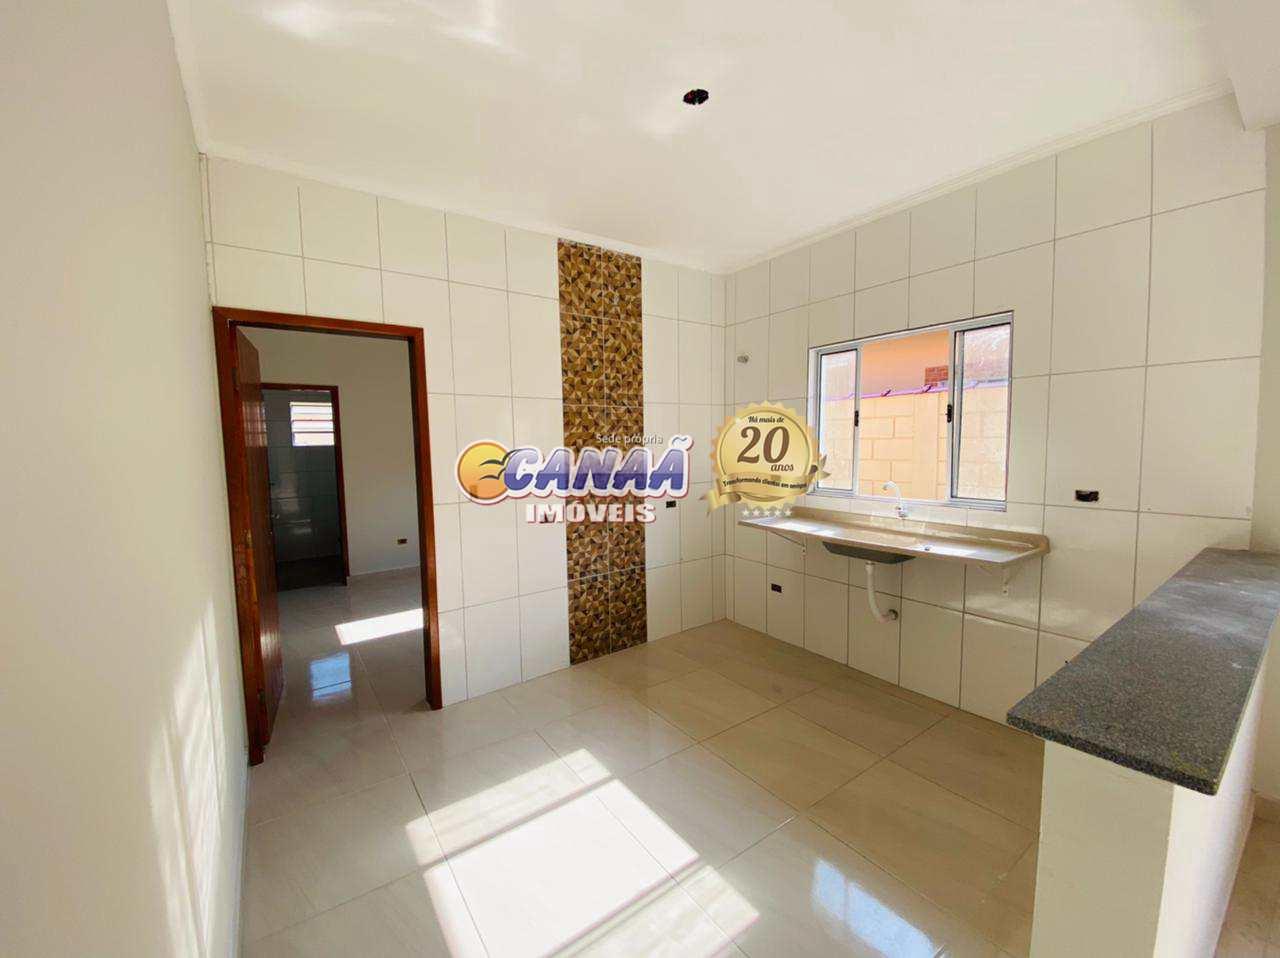 Casa com 2 dorms, Jardim Verde Mar, Itanhaém - R$ 225 mil, Cod: 8132